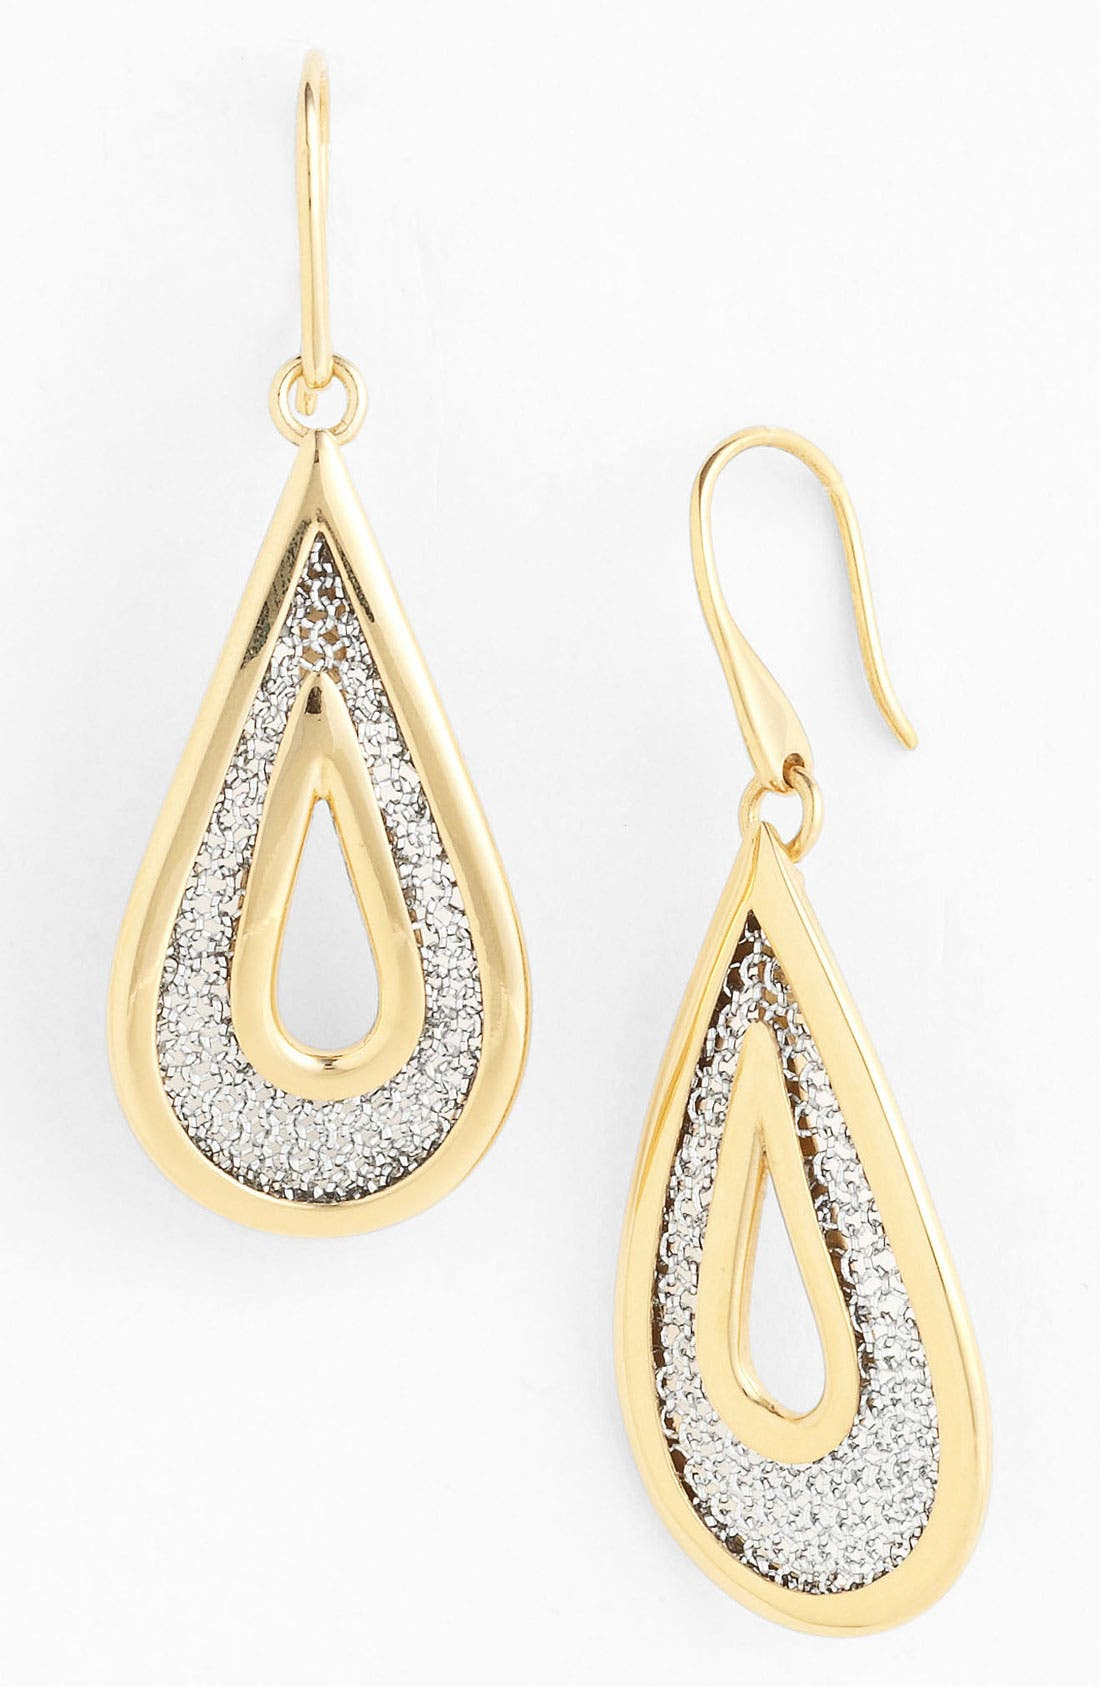 Alternate Image 1 Selected - Adami & Martucci 'Mesh' Small Open Teardrop Earrings (Nordstrom Exclusive)